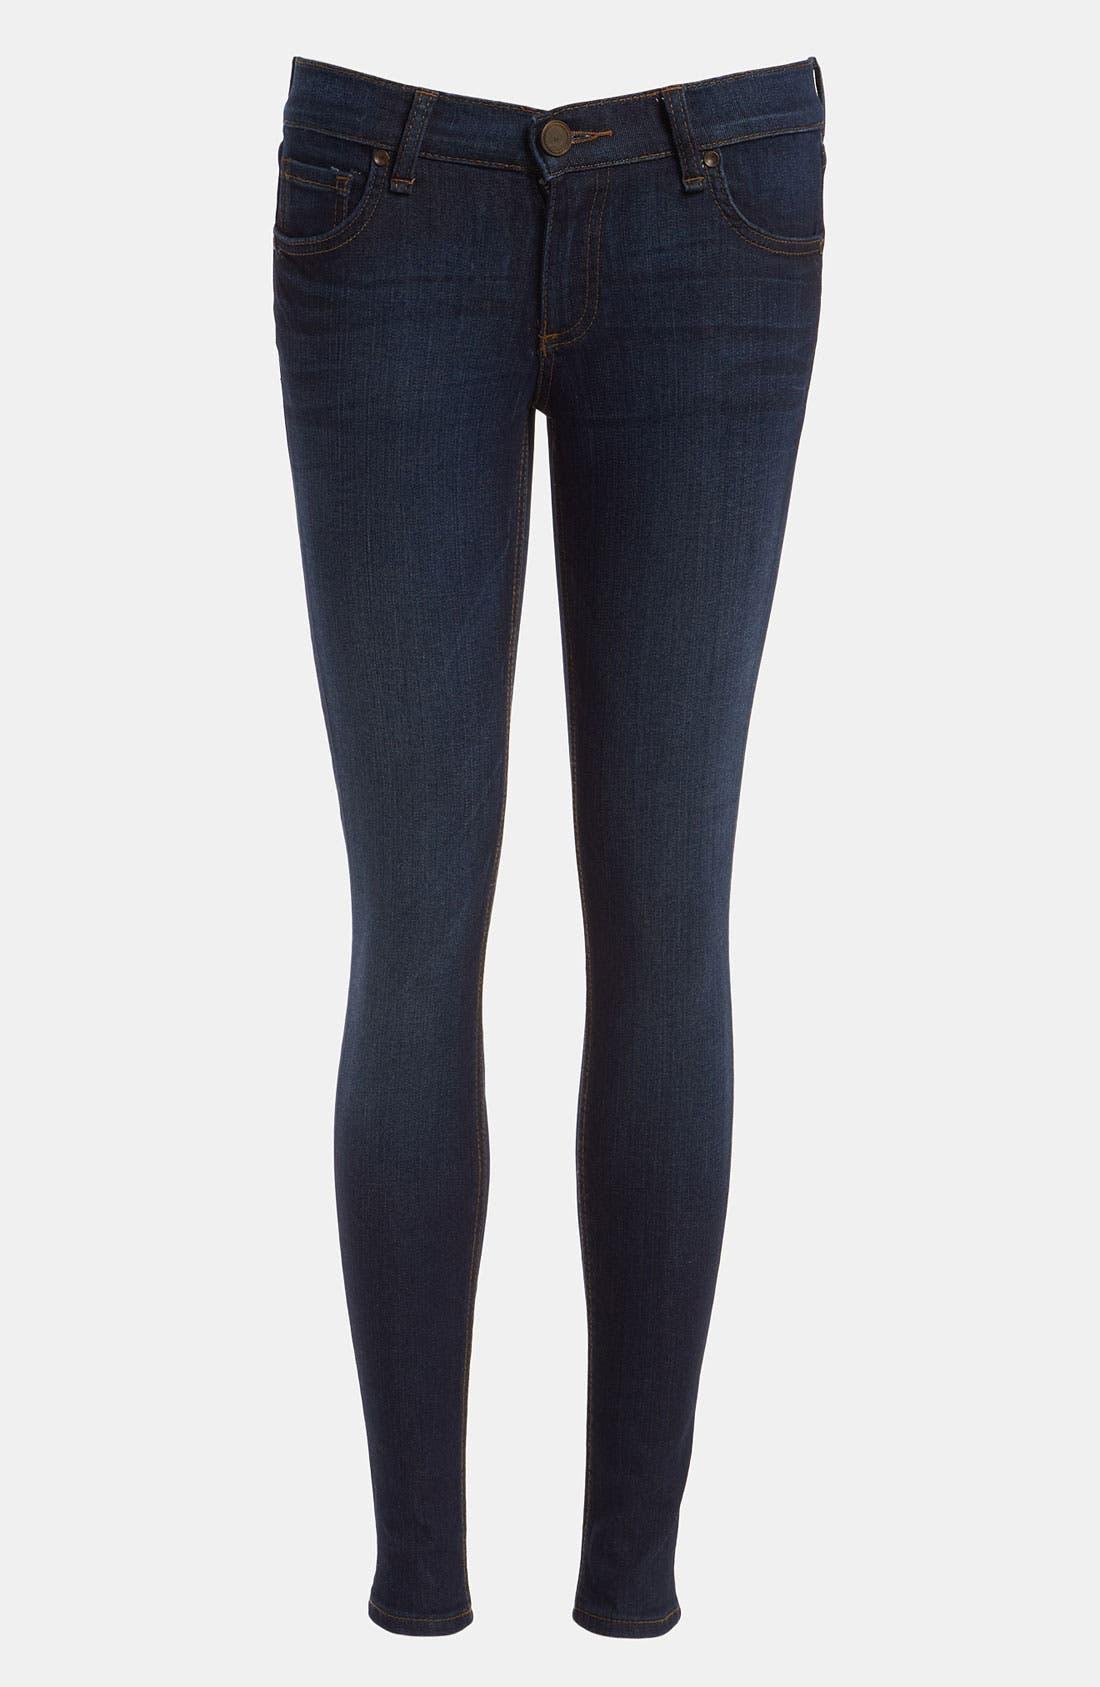 Alternate Image 1 Selected - edyson 'Sloan' Skinny Jeans (Dark Atlantic)